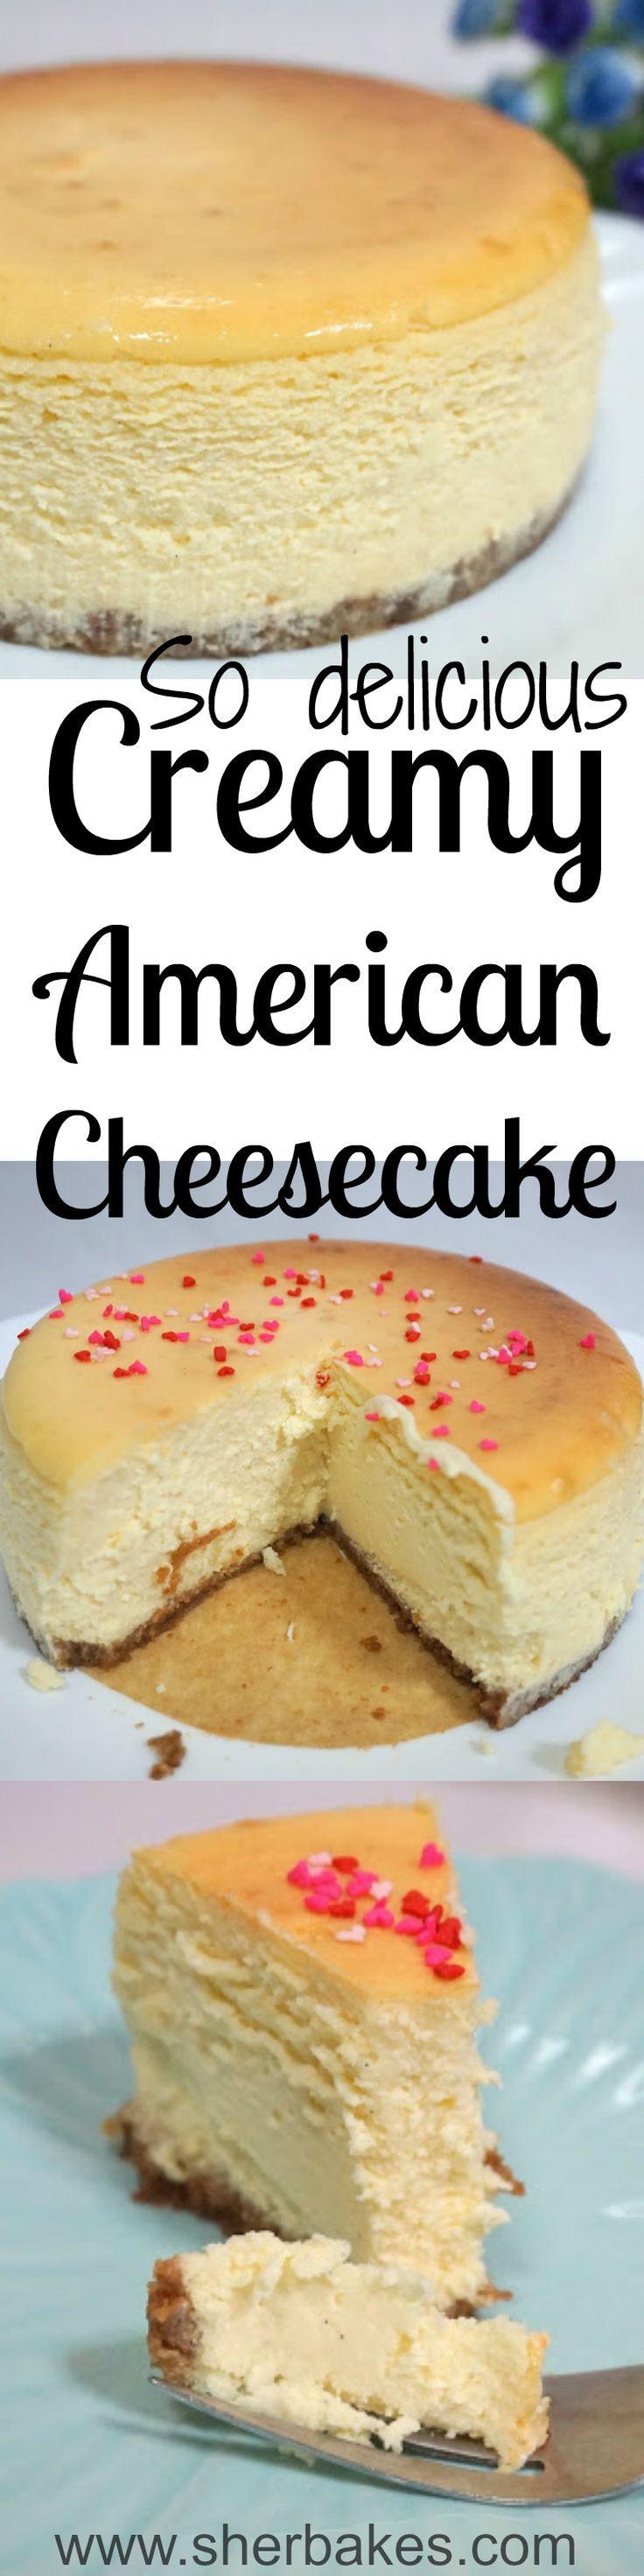 Creamy American Cheesecake